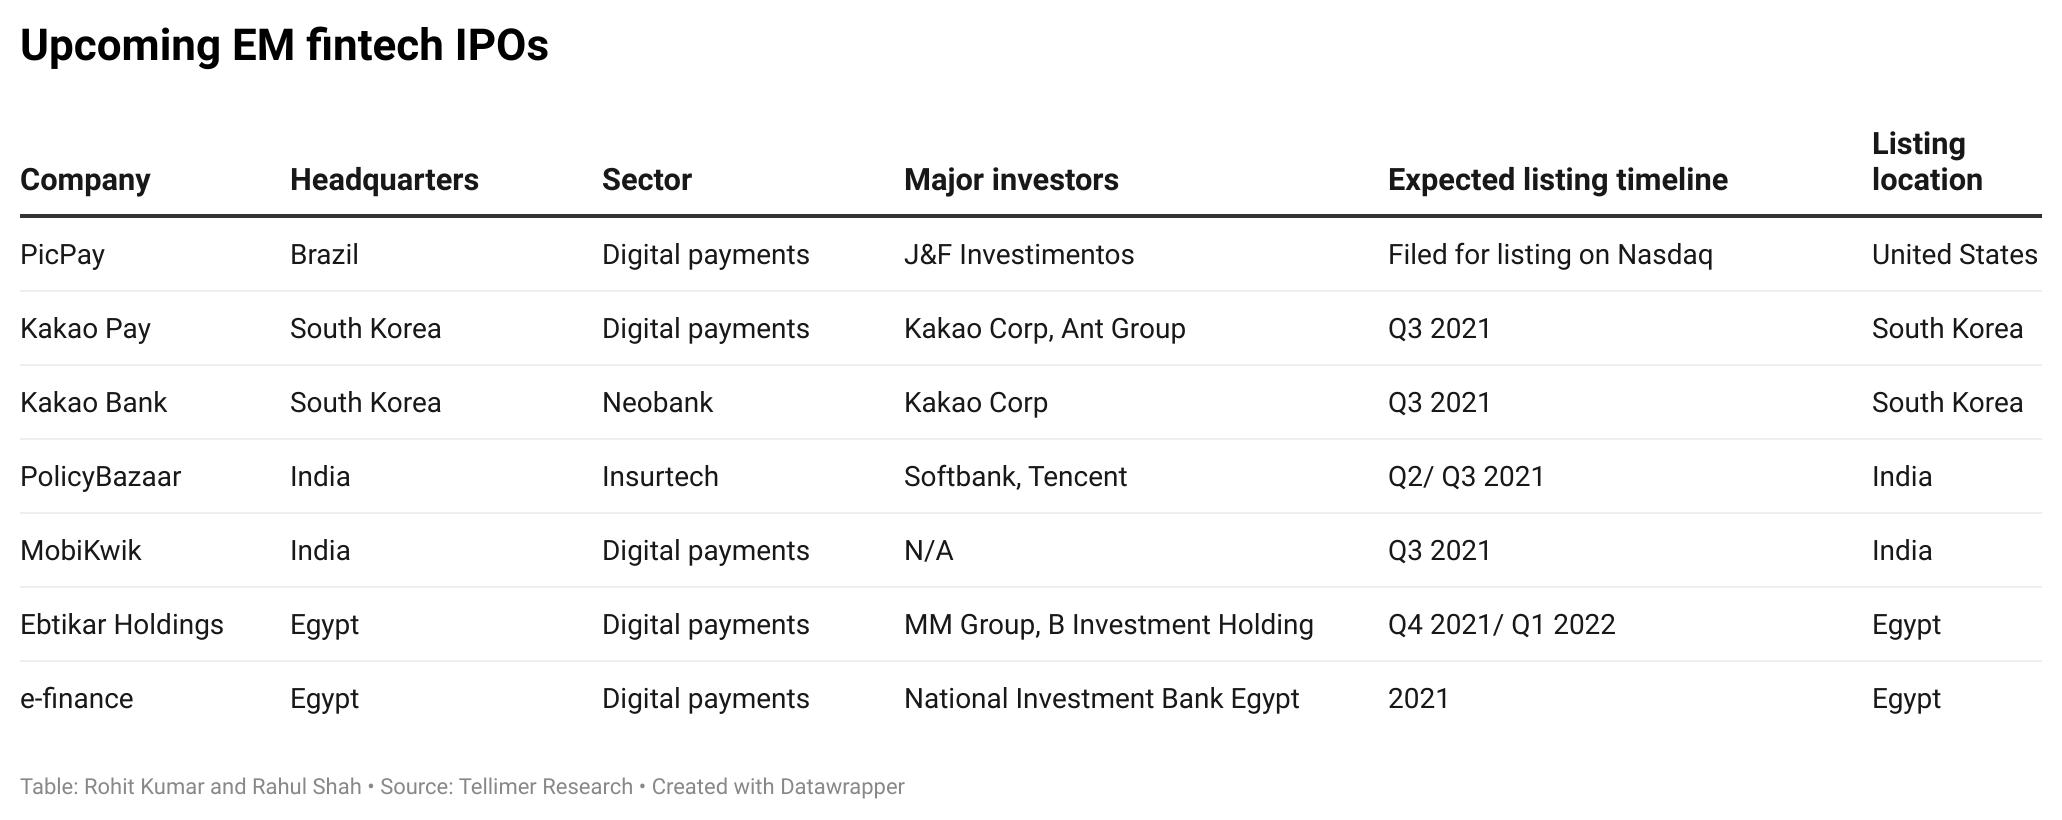 Upcoming EM fintech IPOs